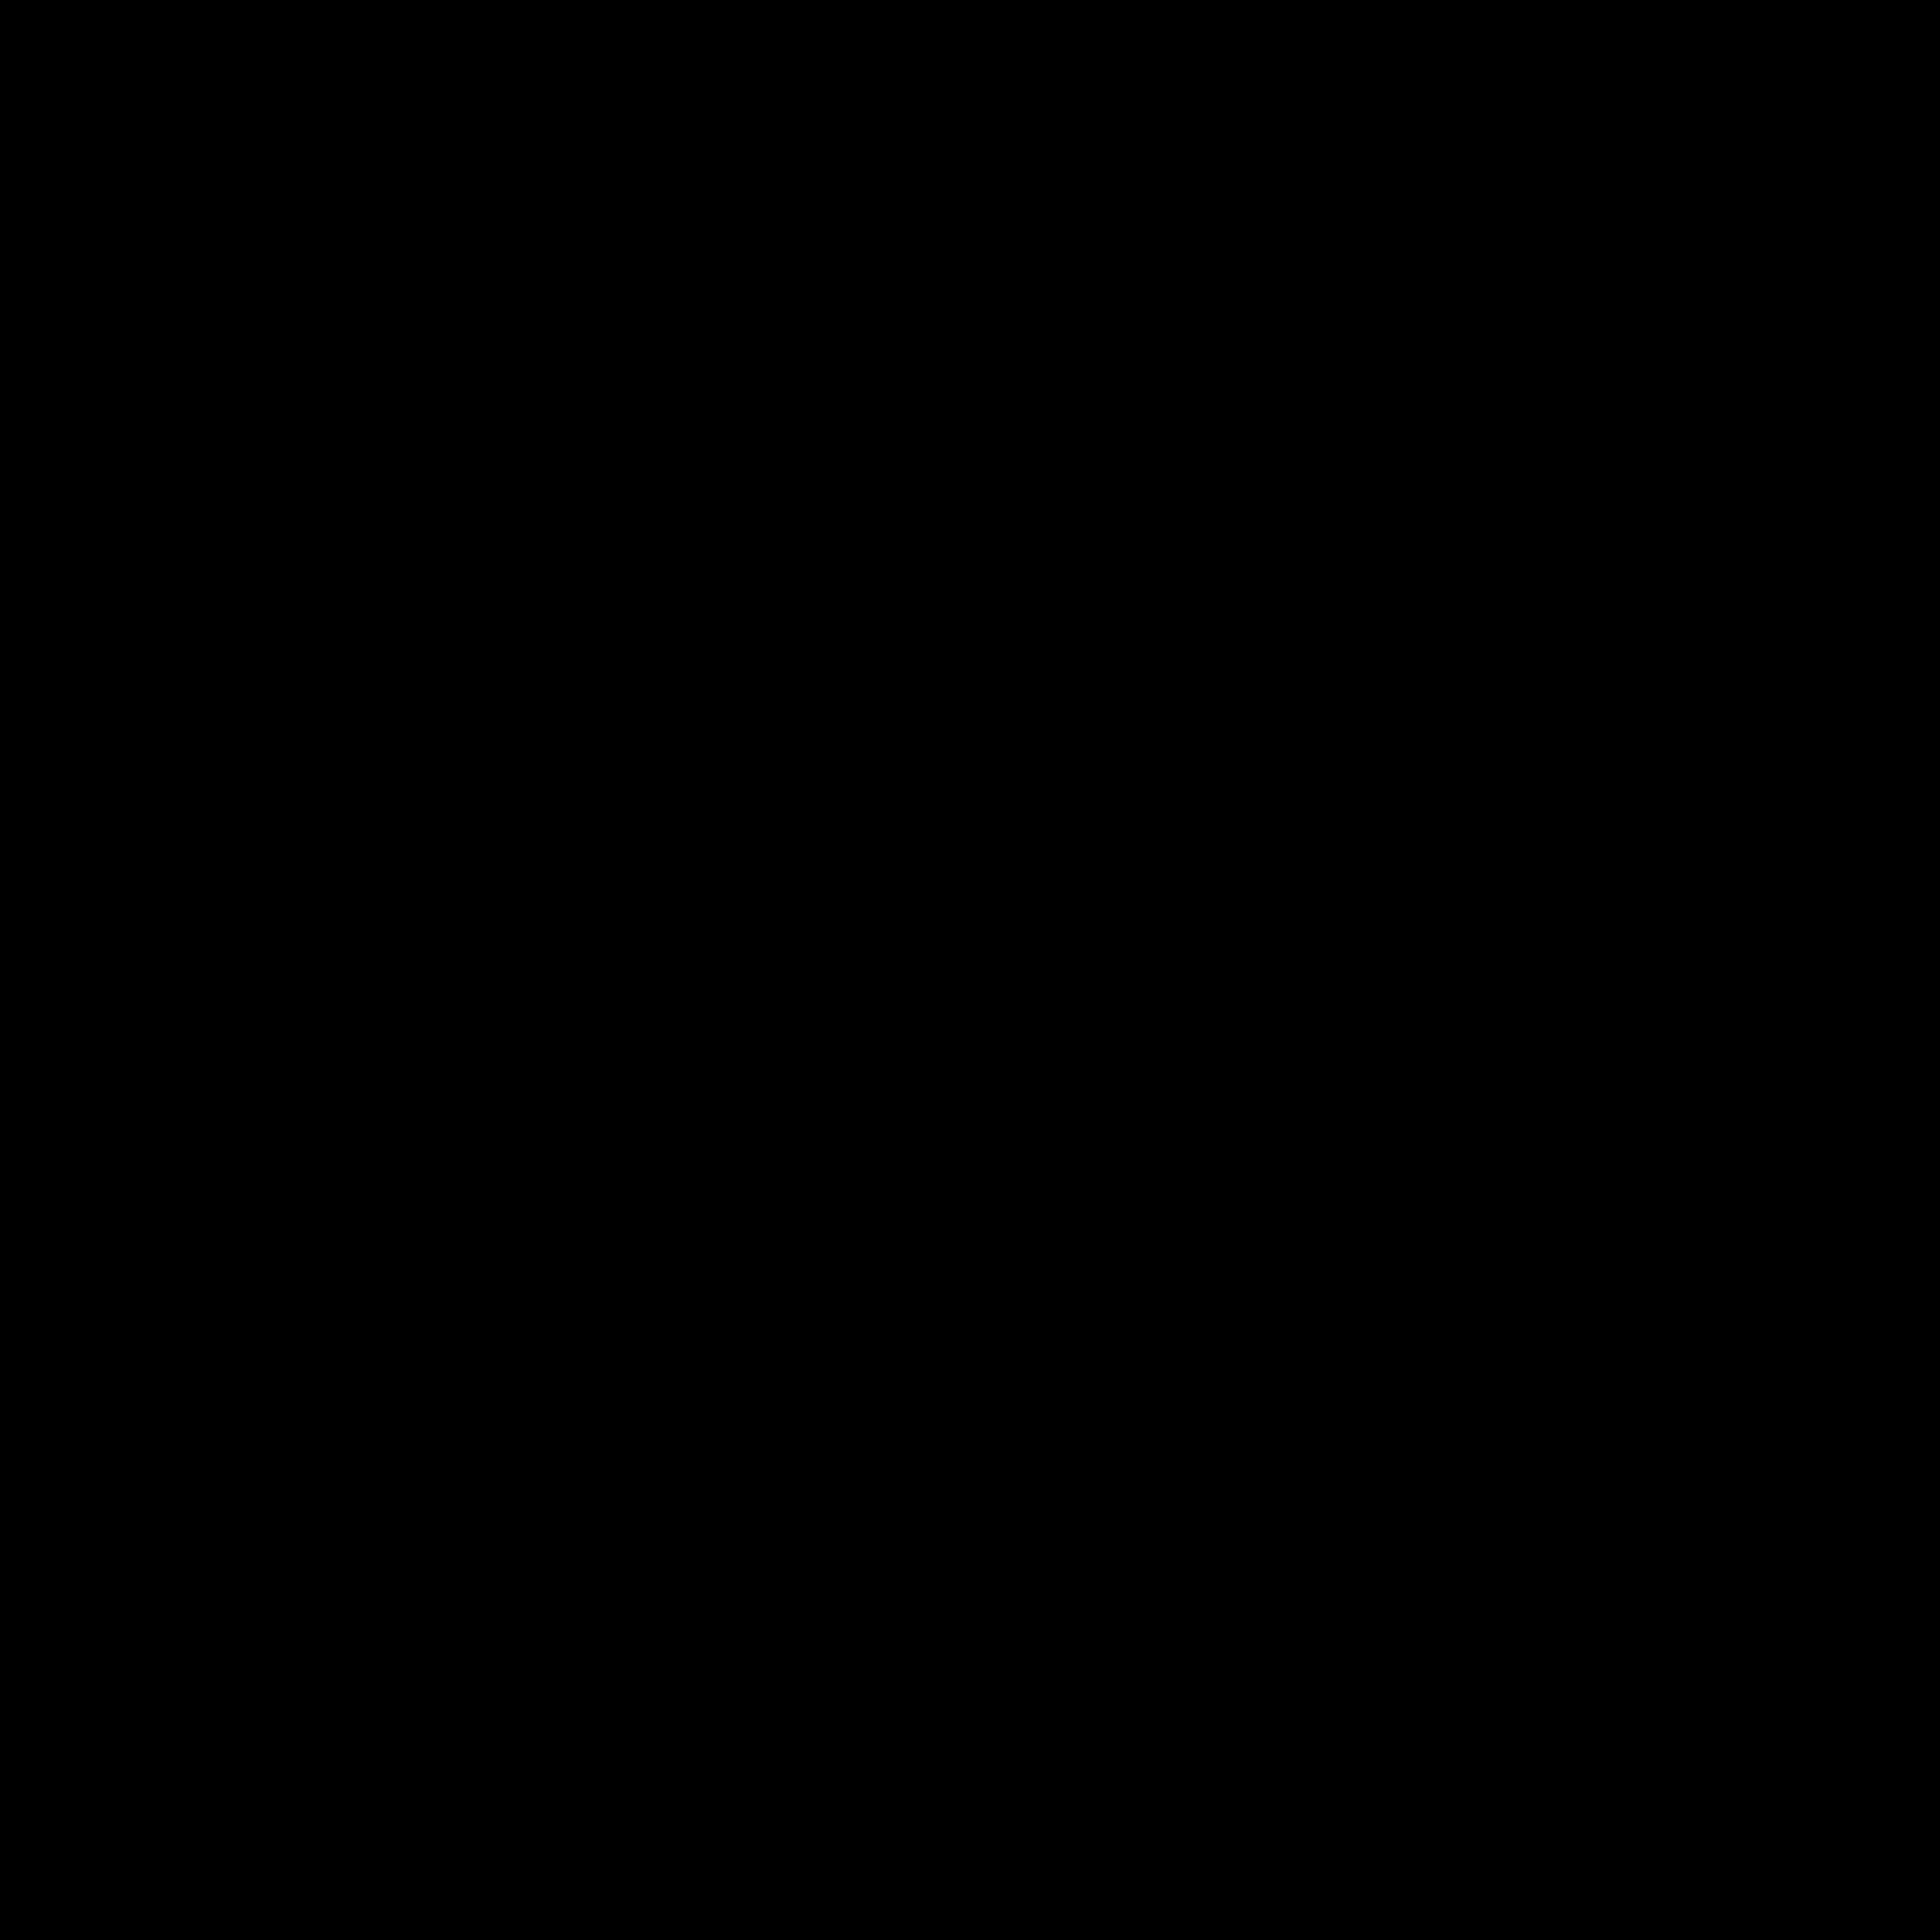 Clipart black sun black and white stock Clipart - Sun Symbol Small Black black and white stock